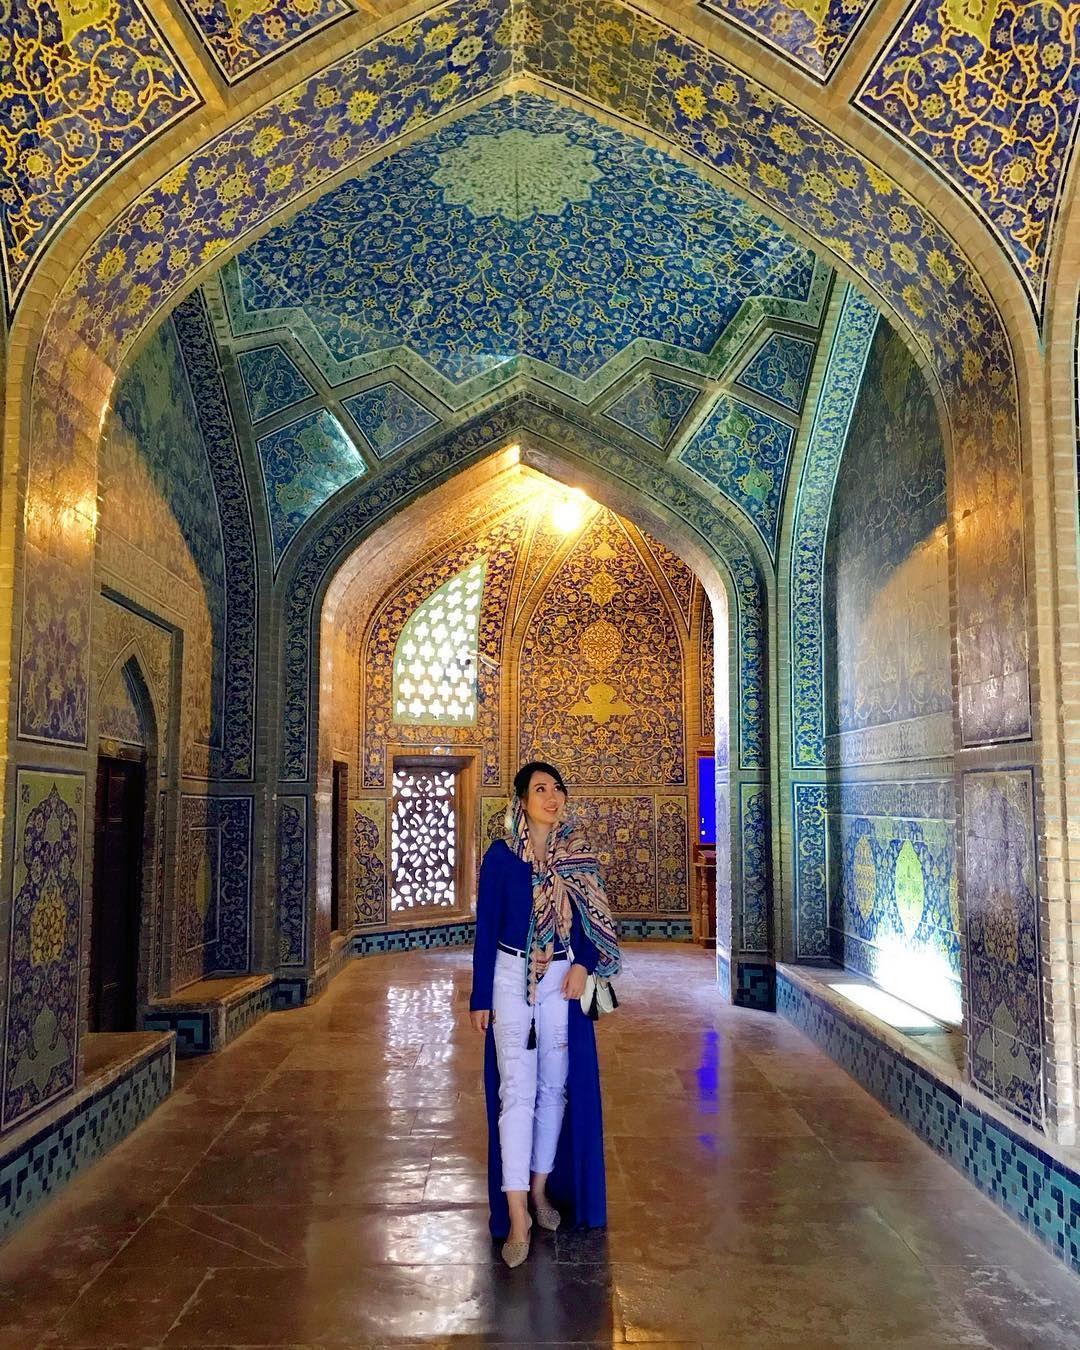 sheikhlotfollahmosque#isfahan ، Iran | Shiraz iran, Persian architecture, Iran tourism